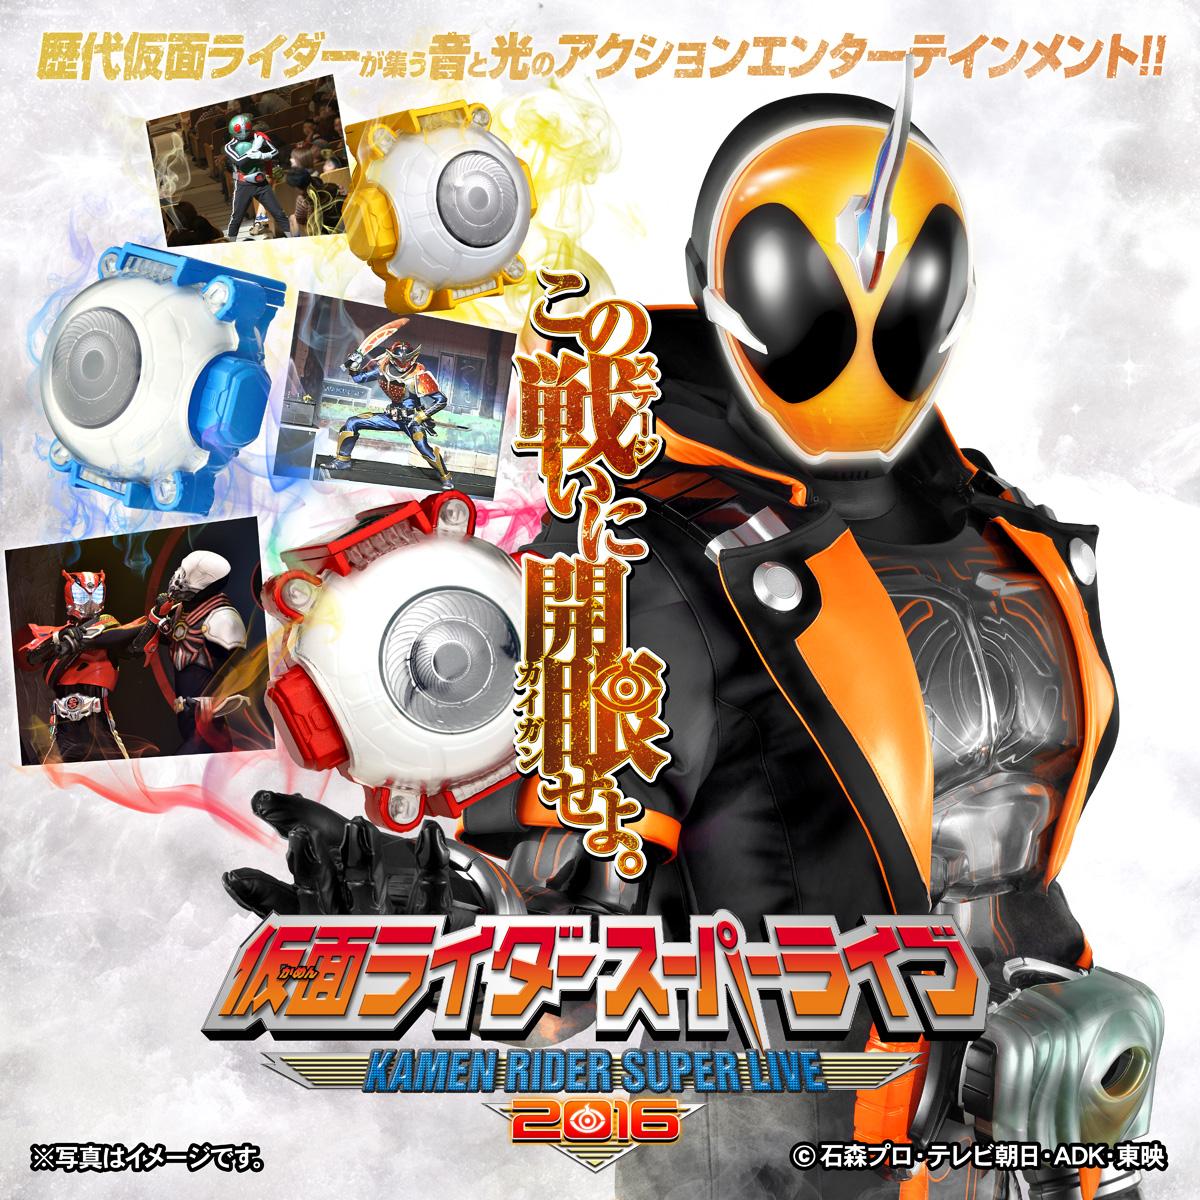 <span class='b'>仮面ライダースーパーライブ2016</span>